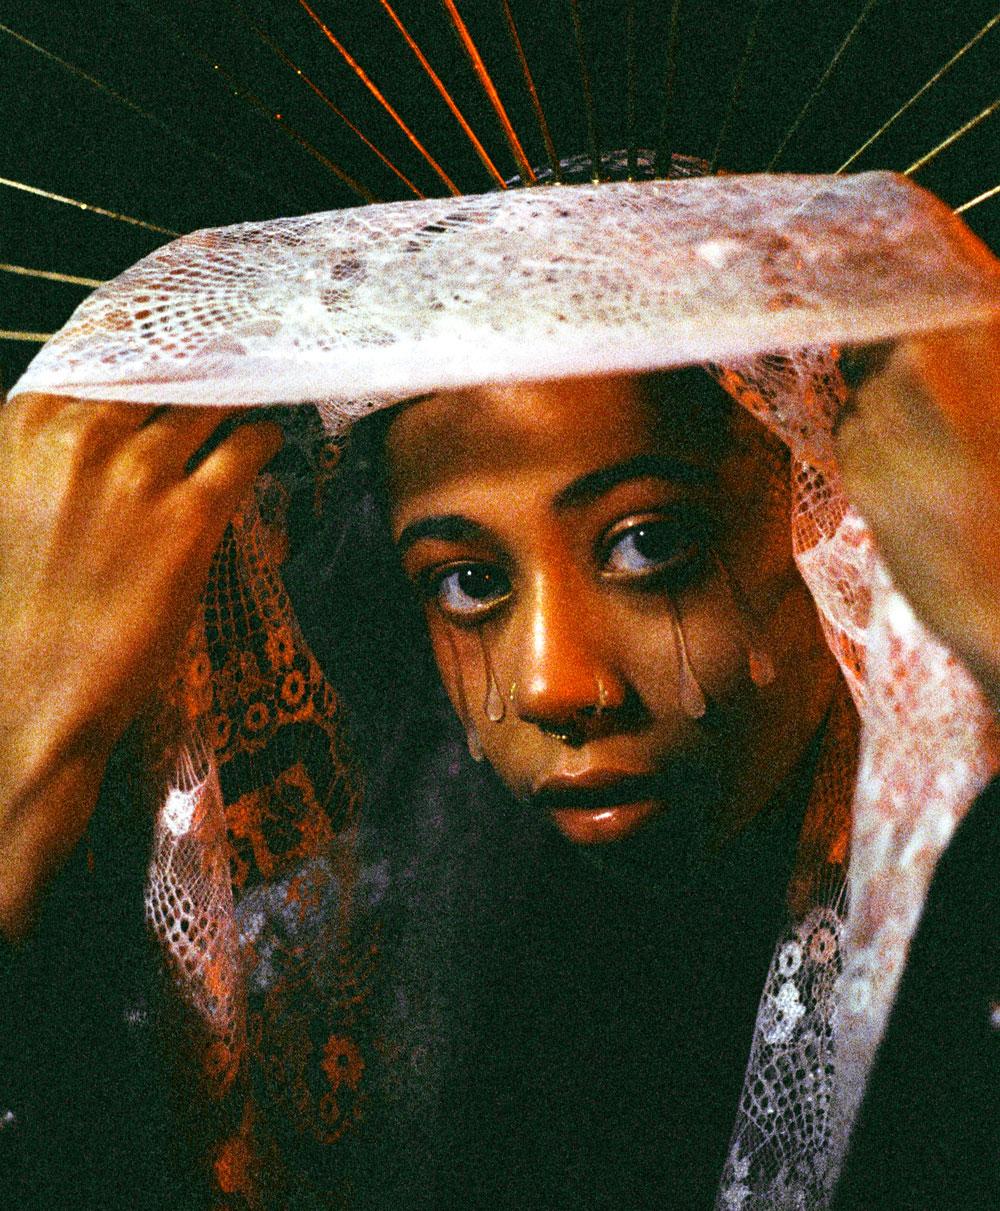 35mm film photo of woman lifting white veil